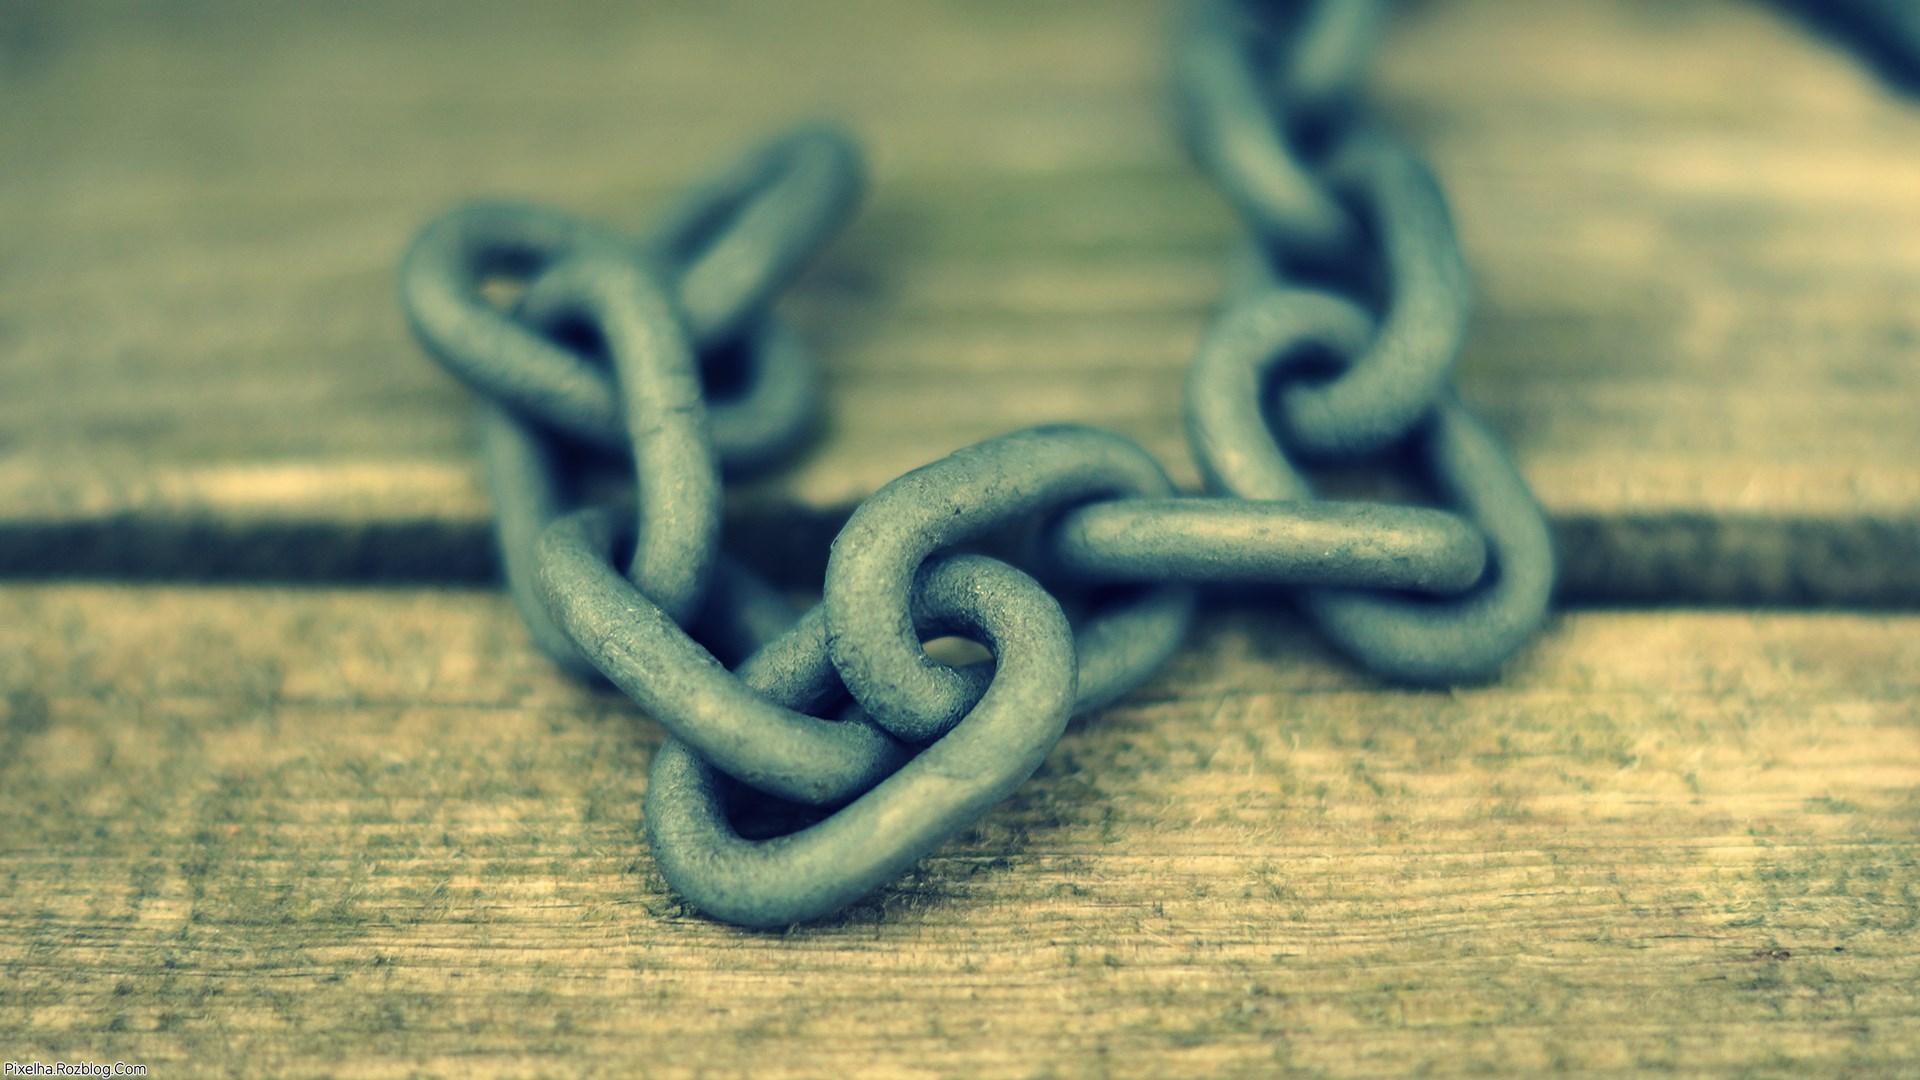 زنجیر آهنی